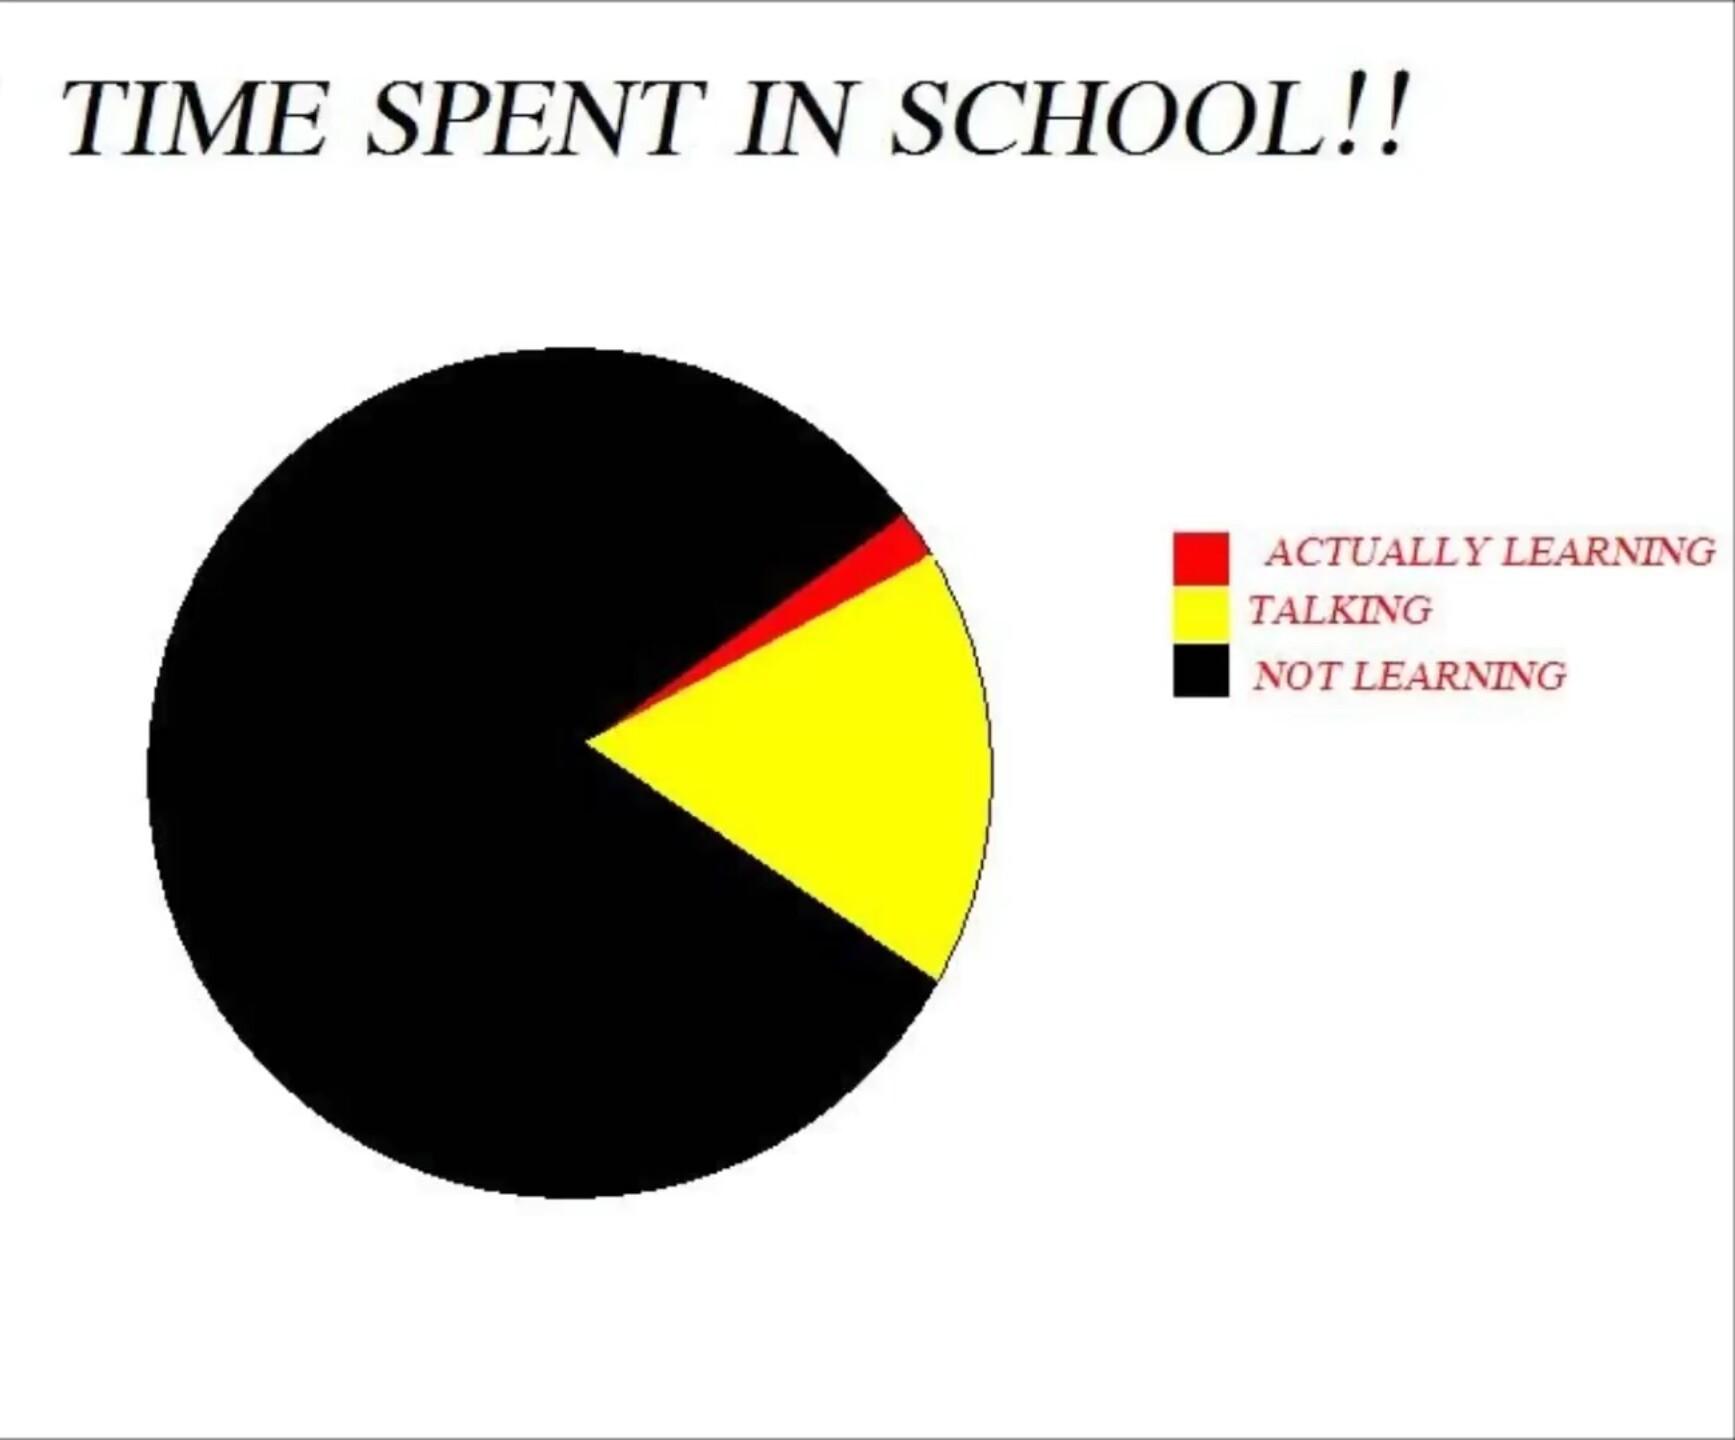 My time in school - meme